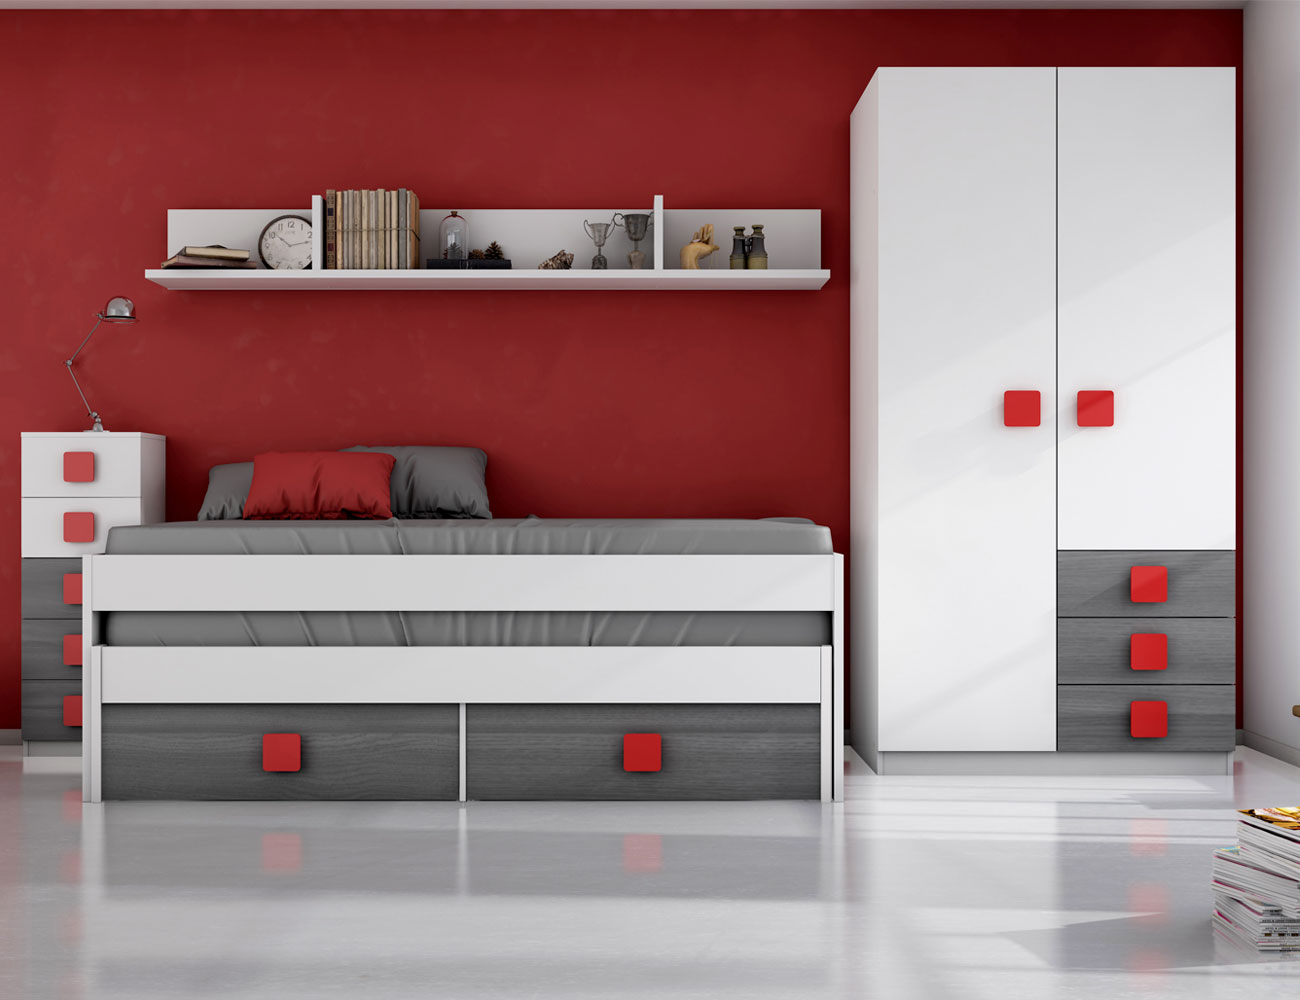 Dormitorio juvenil ceniza rojo6